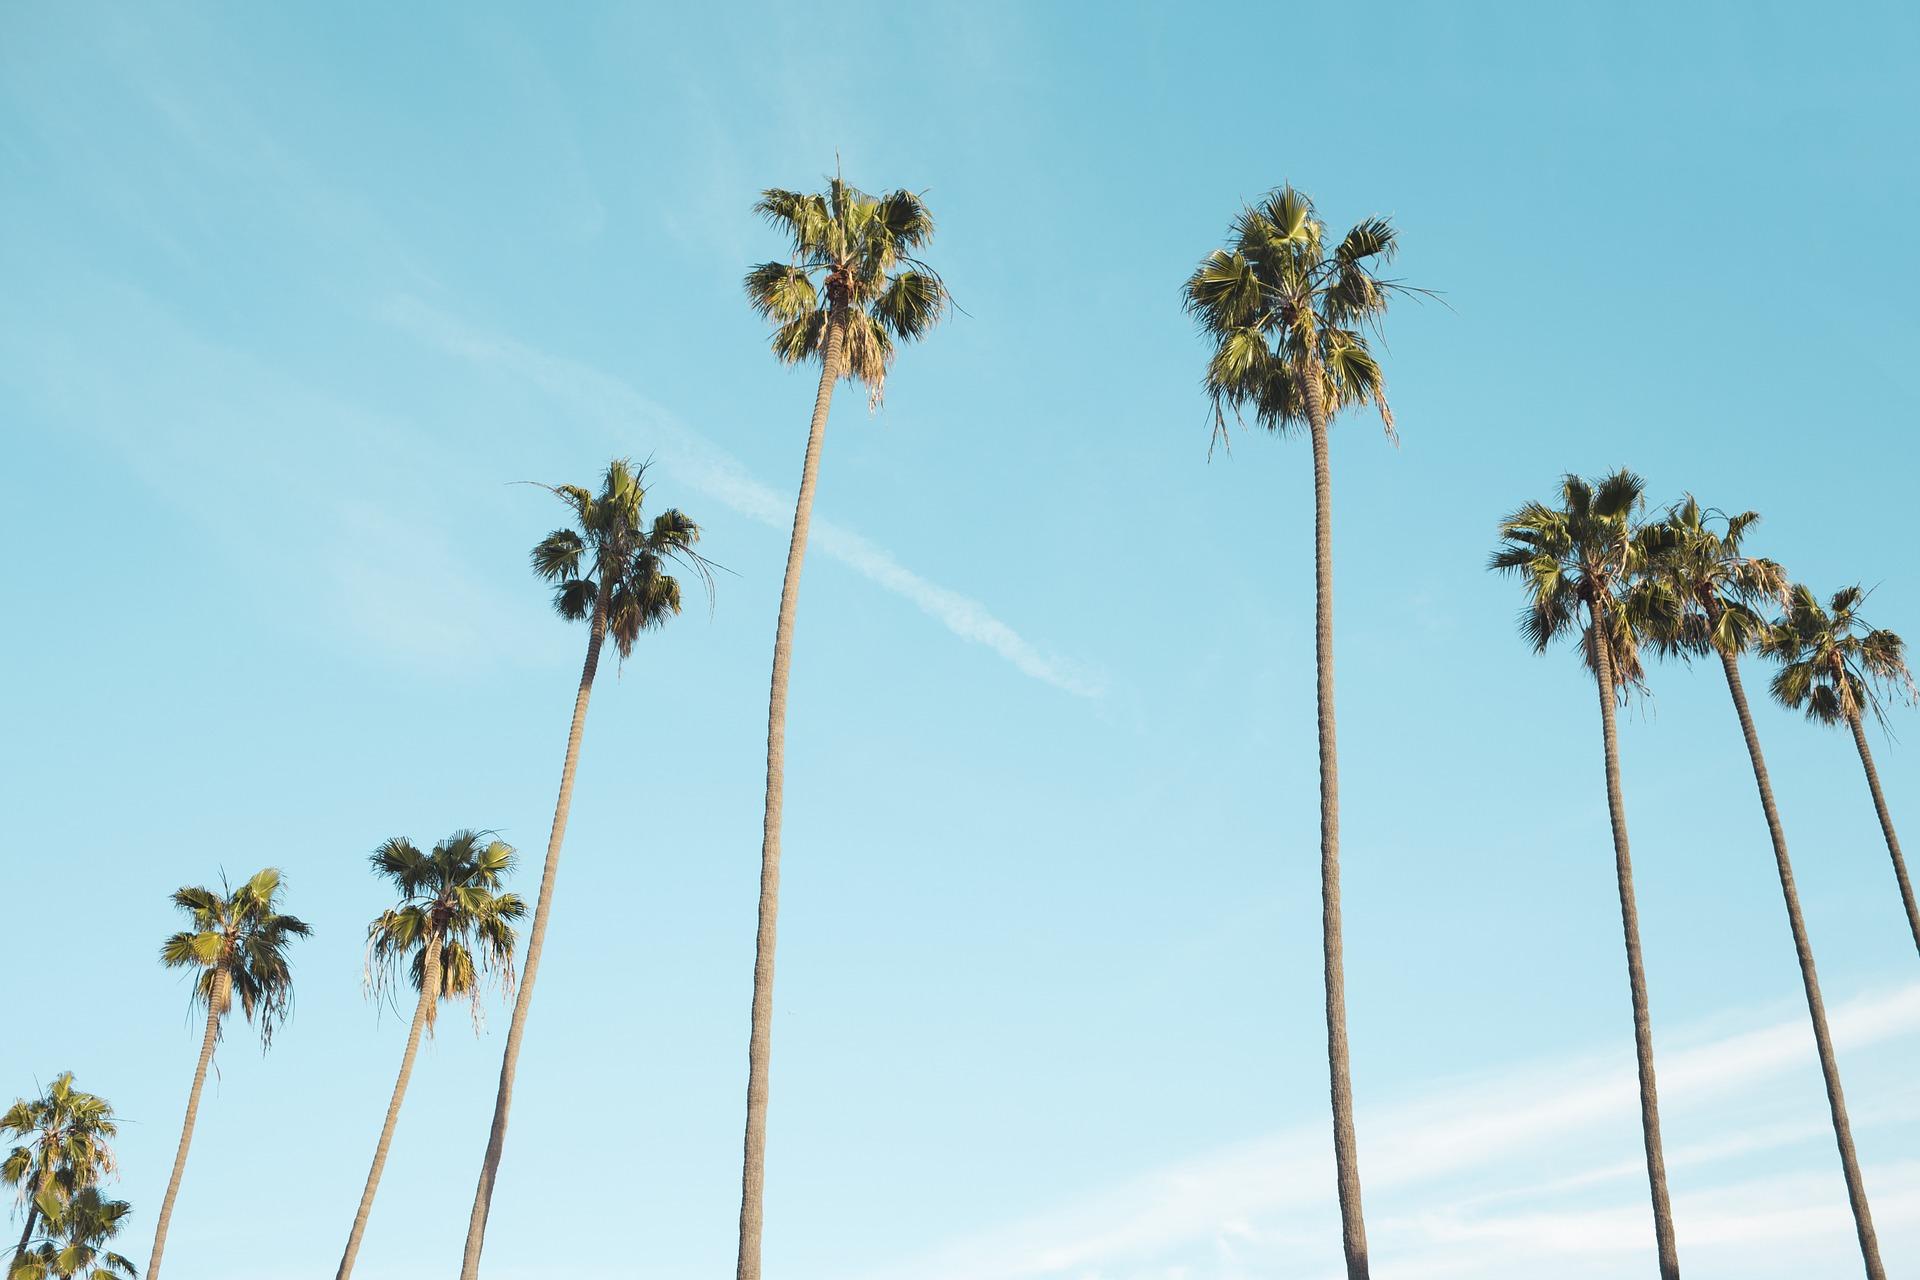 4 Reasons to Hire a Los Angeles SEO Company